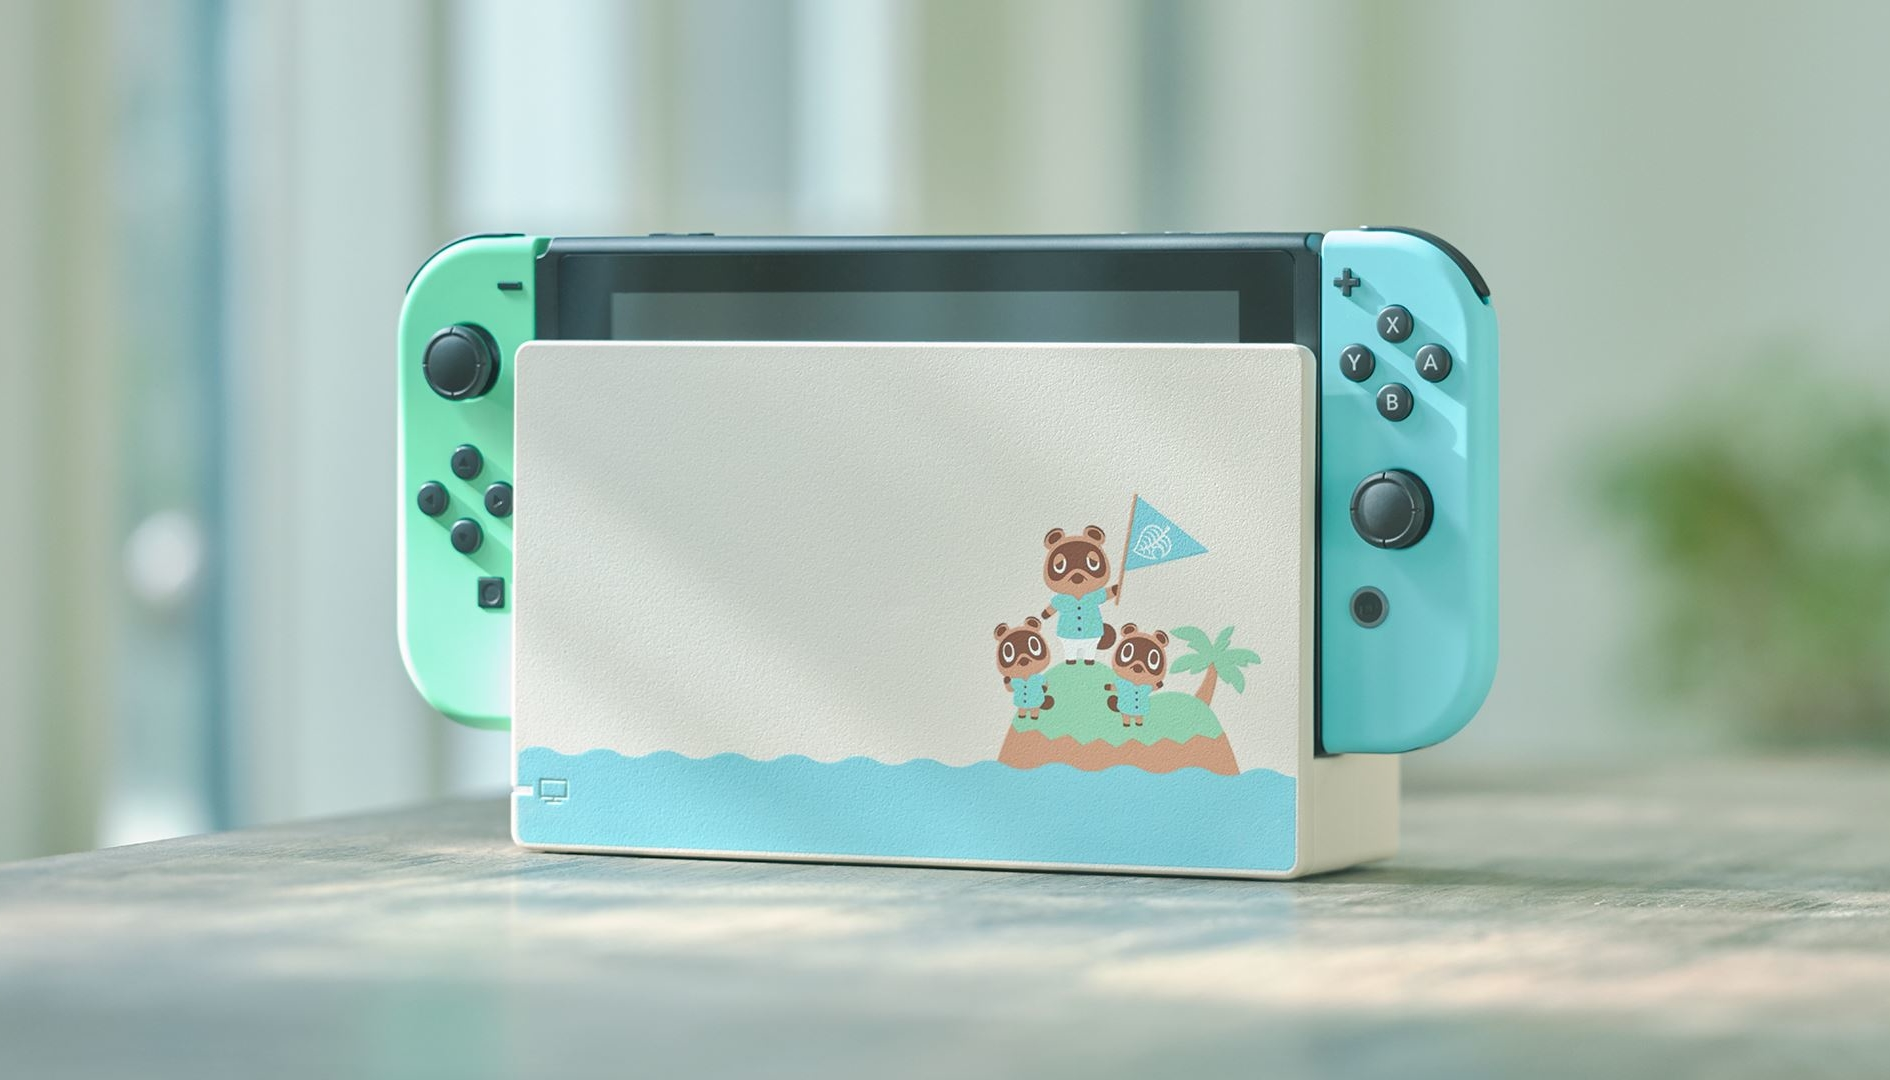 Nintendo Switch: edizione limitata a tema Animal Crossing New Horizons svelata